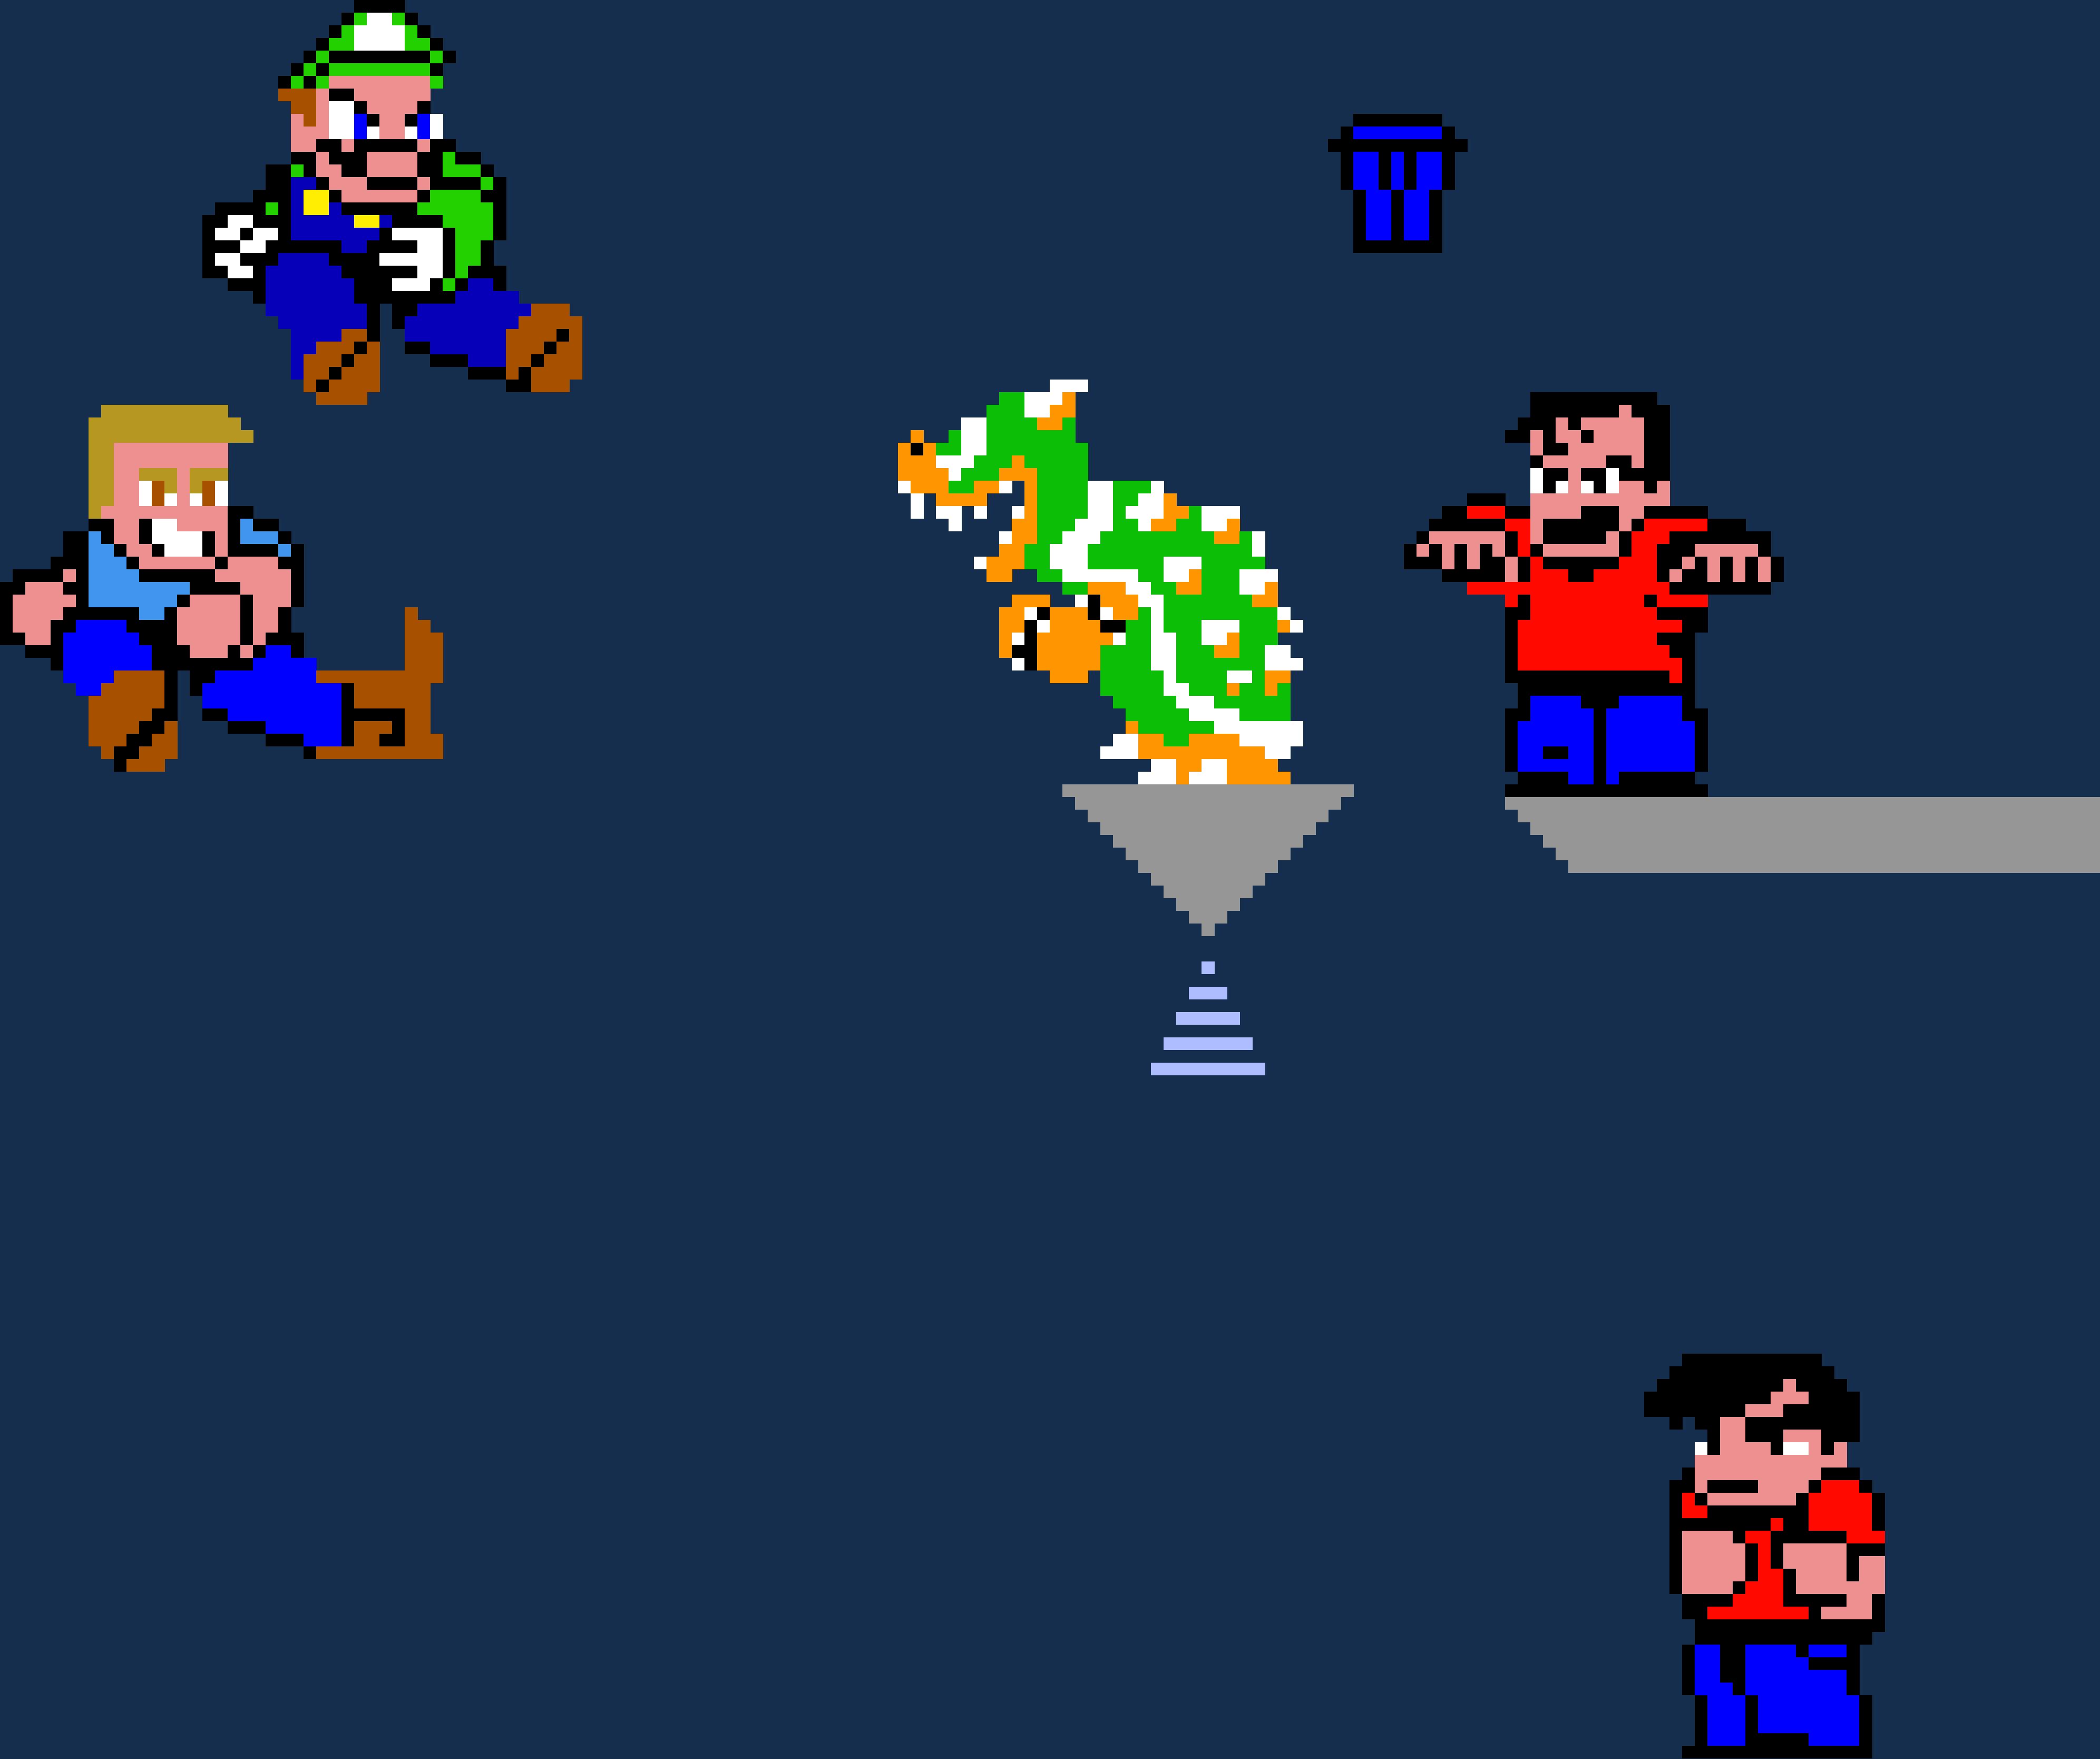 BATTLE ROYALE! Julio and Luigi VS Bowser and Slick - Grid Paint